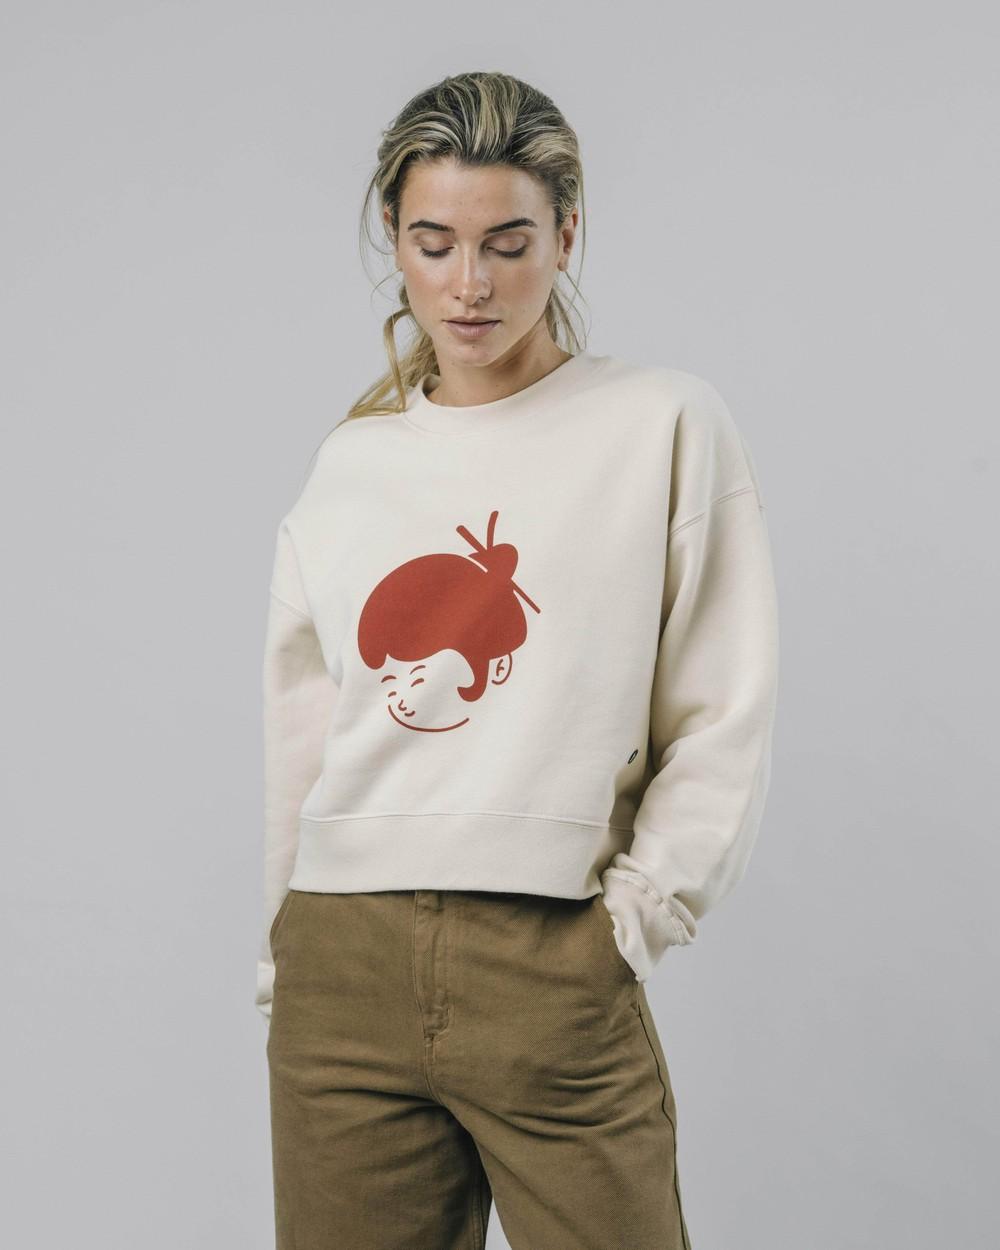 Yoko sweatshirt - Brava Fabrics